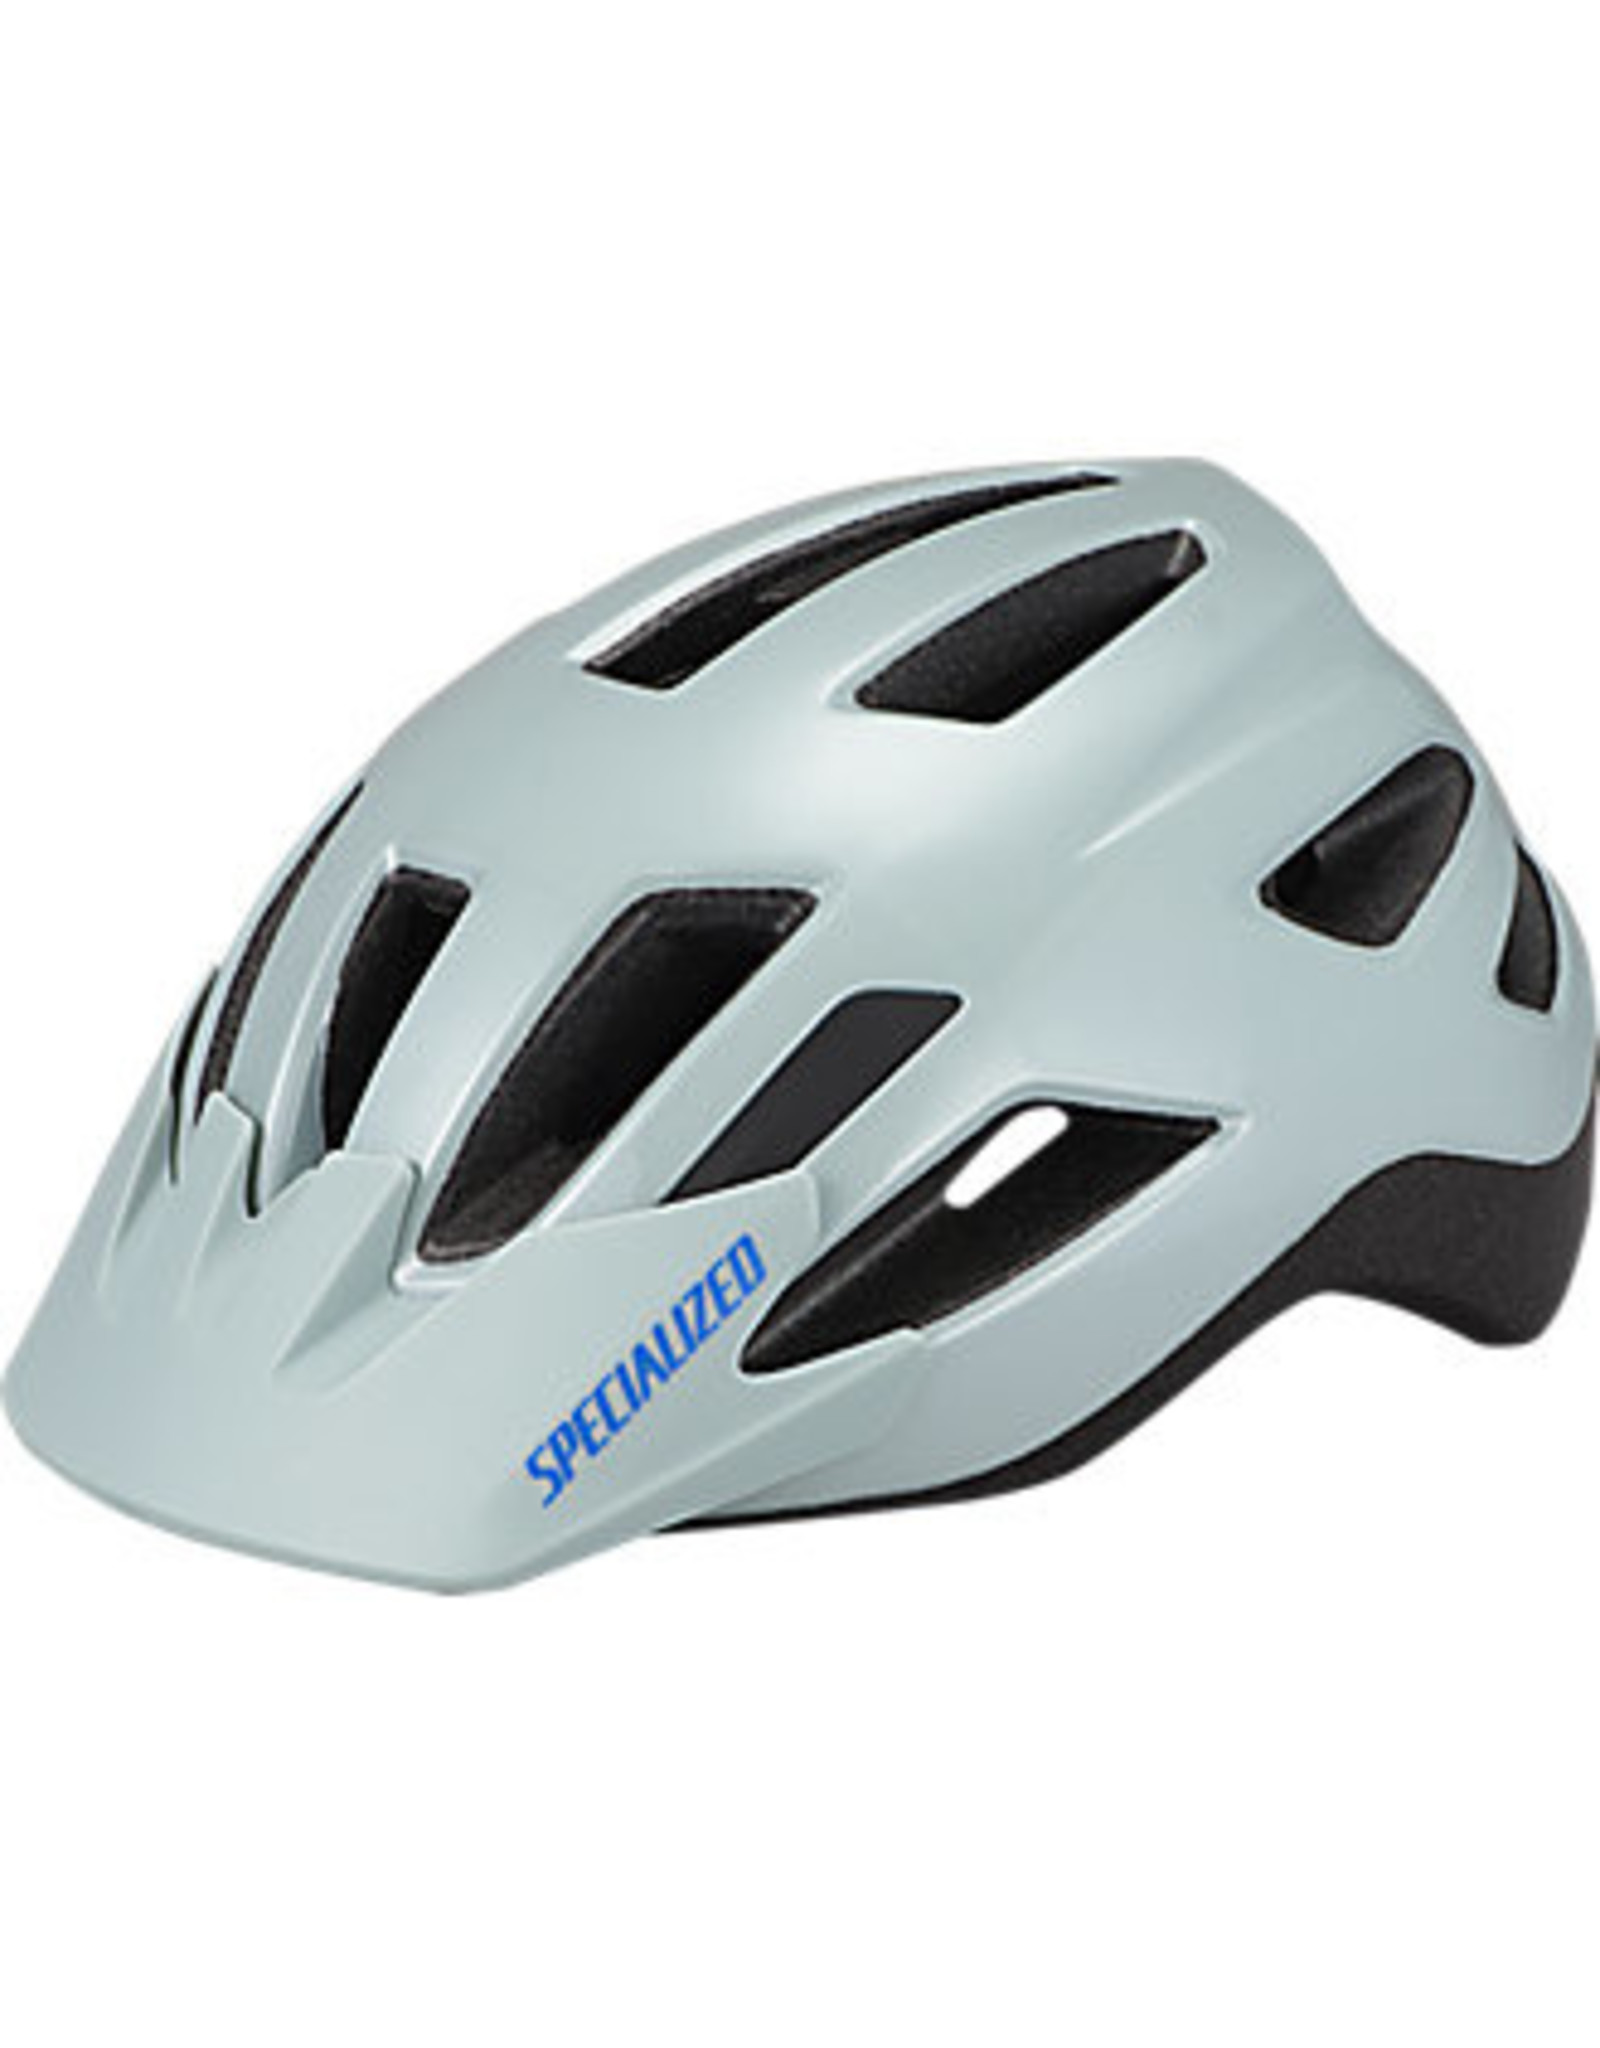 SPECIALIZED Specialized Shuffle Standard Buckle Child Helmet